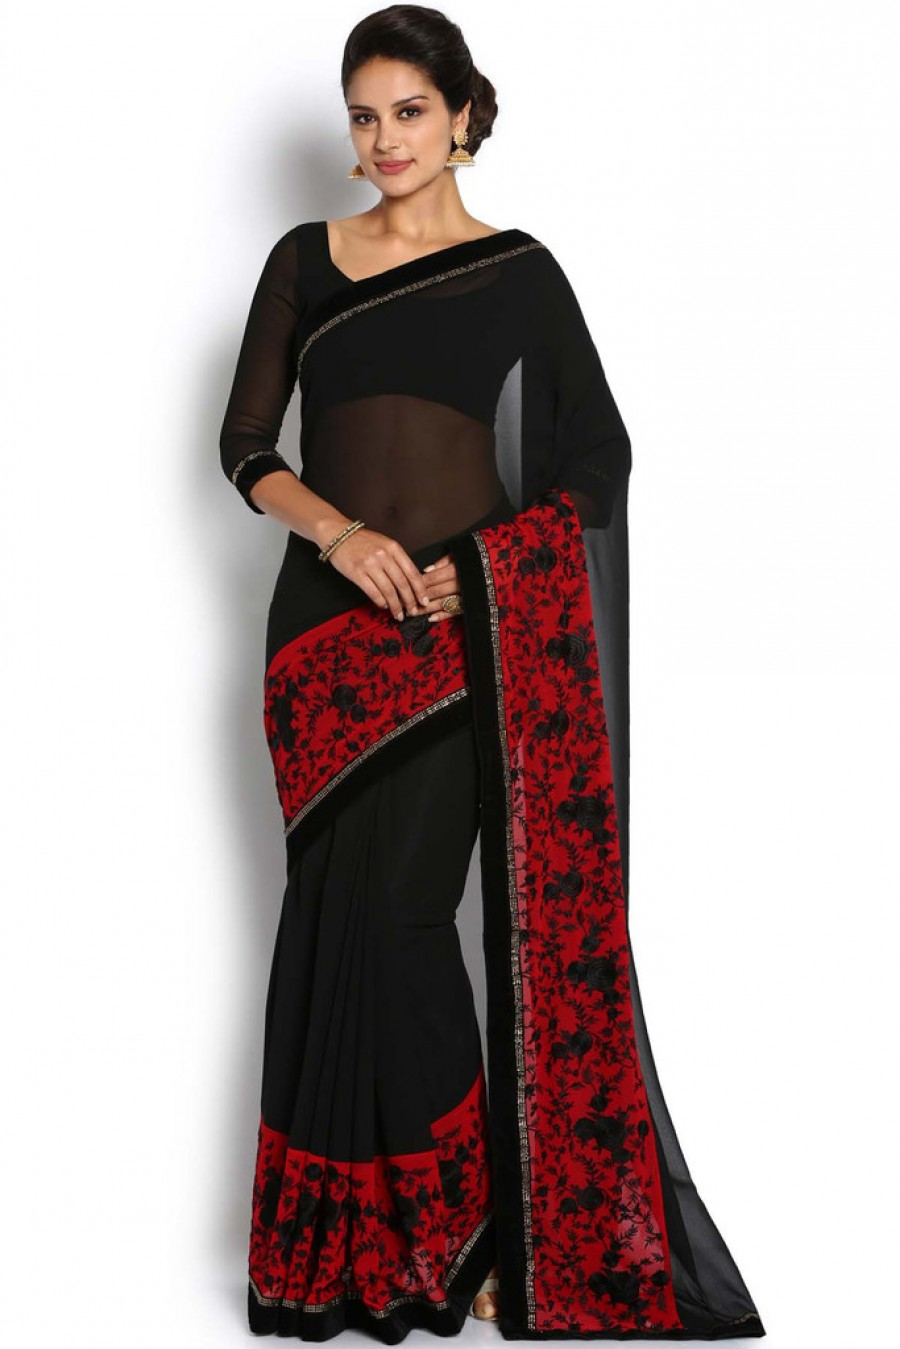 women in red and black sari